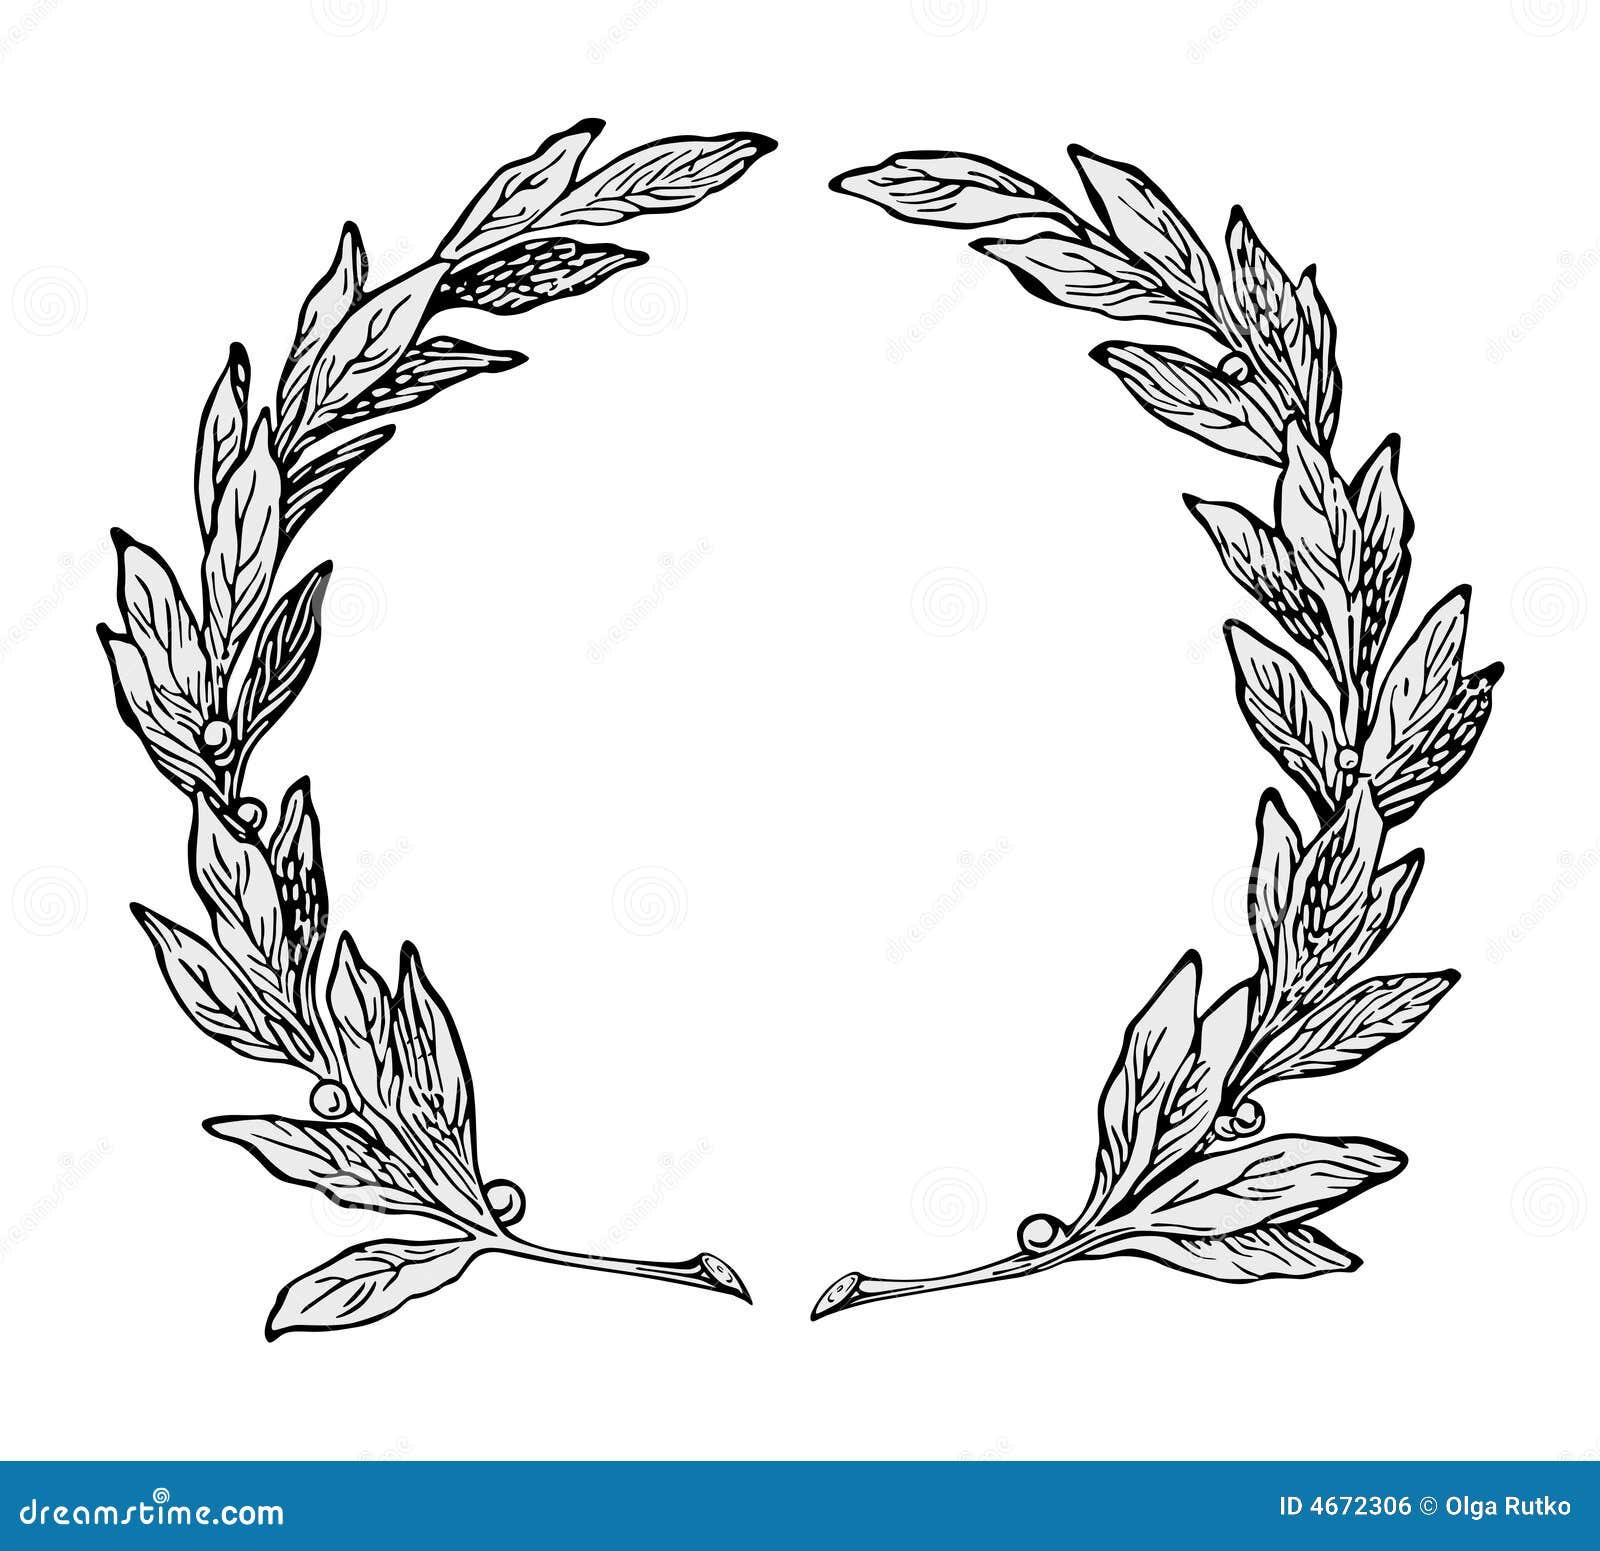 Wreath ornament vector